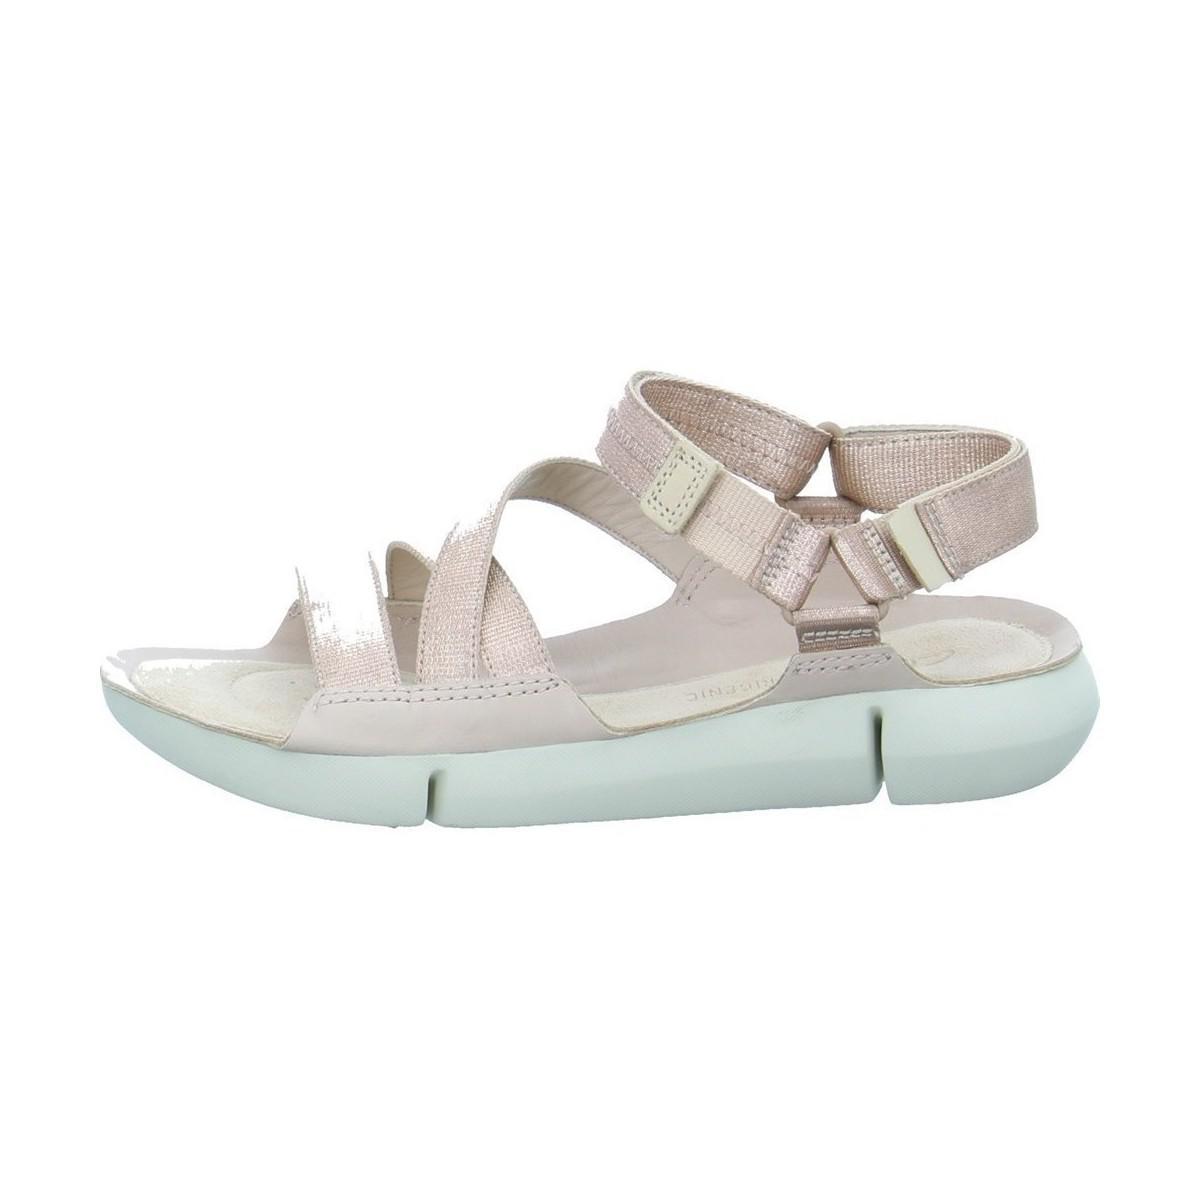 40d28ed6820b6e Clarks Tri Sienna Women s Sandals In Pink in Pink - Lyst